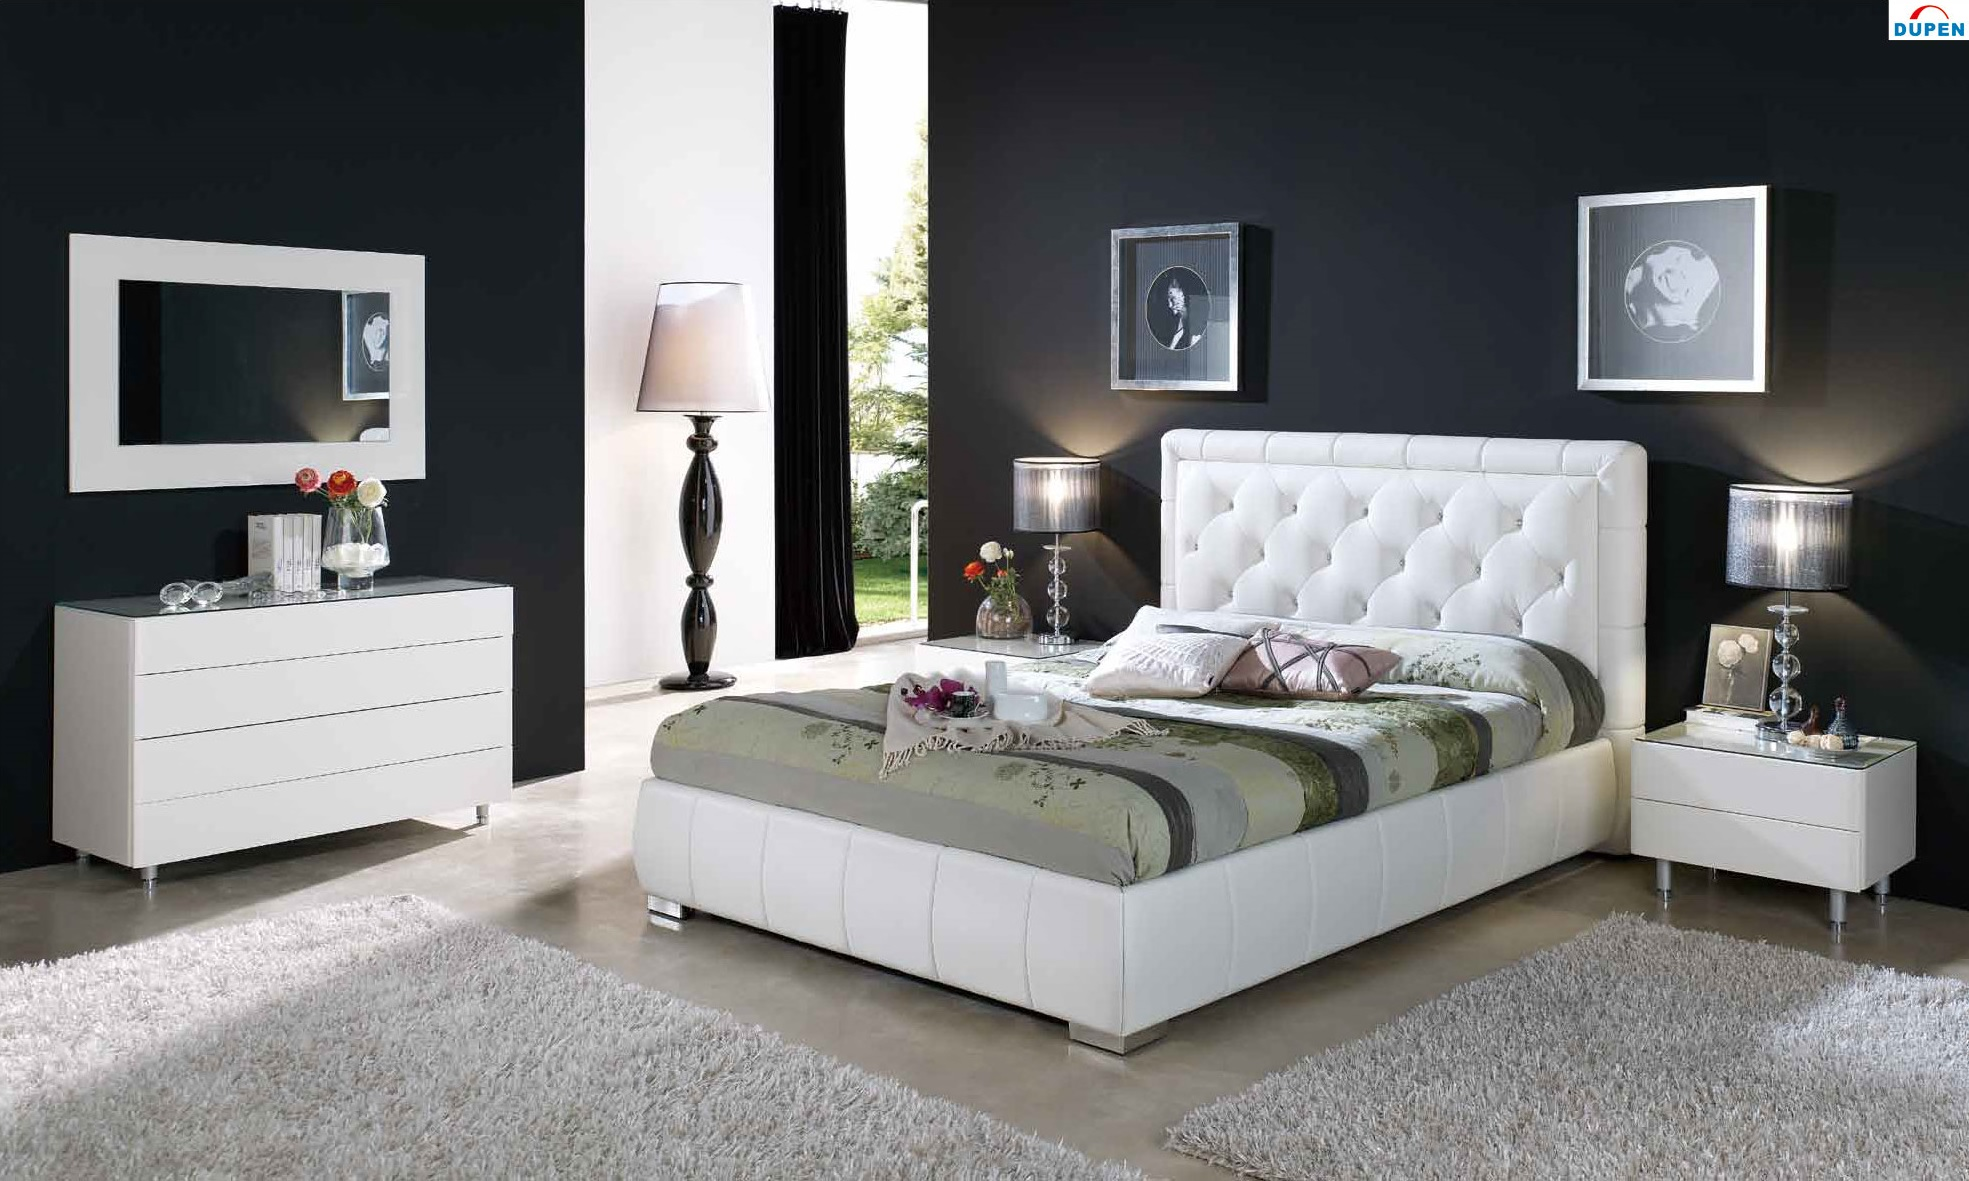 interior design bedroom black furniture photo - 5